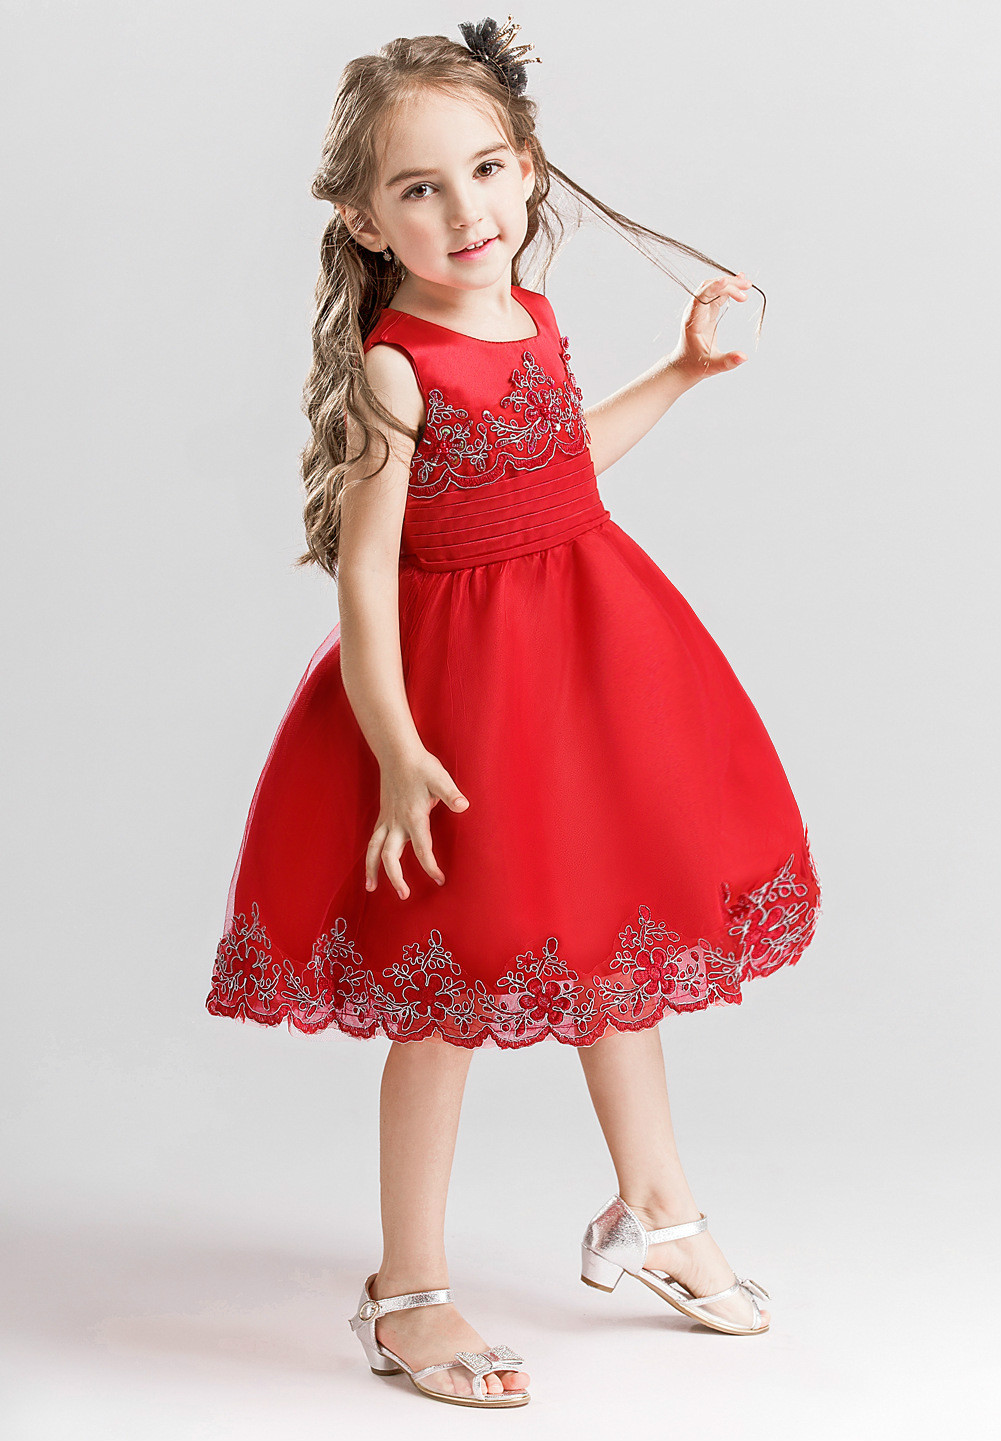 2018 Kids Wedding Summer Party Dresses For Girls Birthday Princess Costume Children Toddler Elegant Vestido 3 6 8 10 12 years<br>